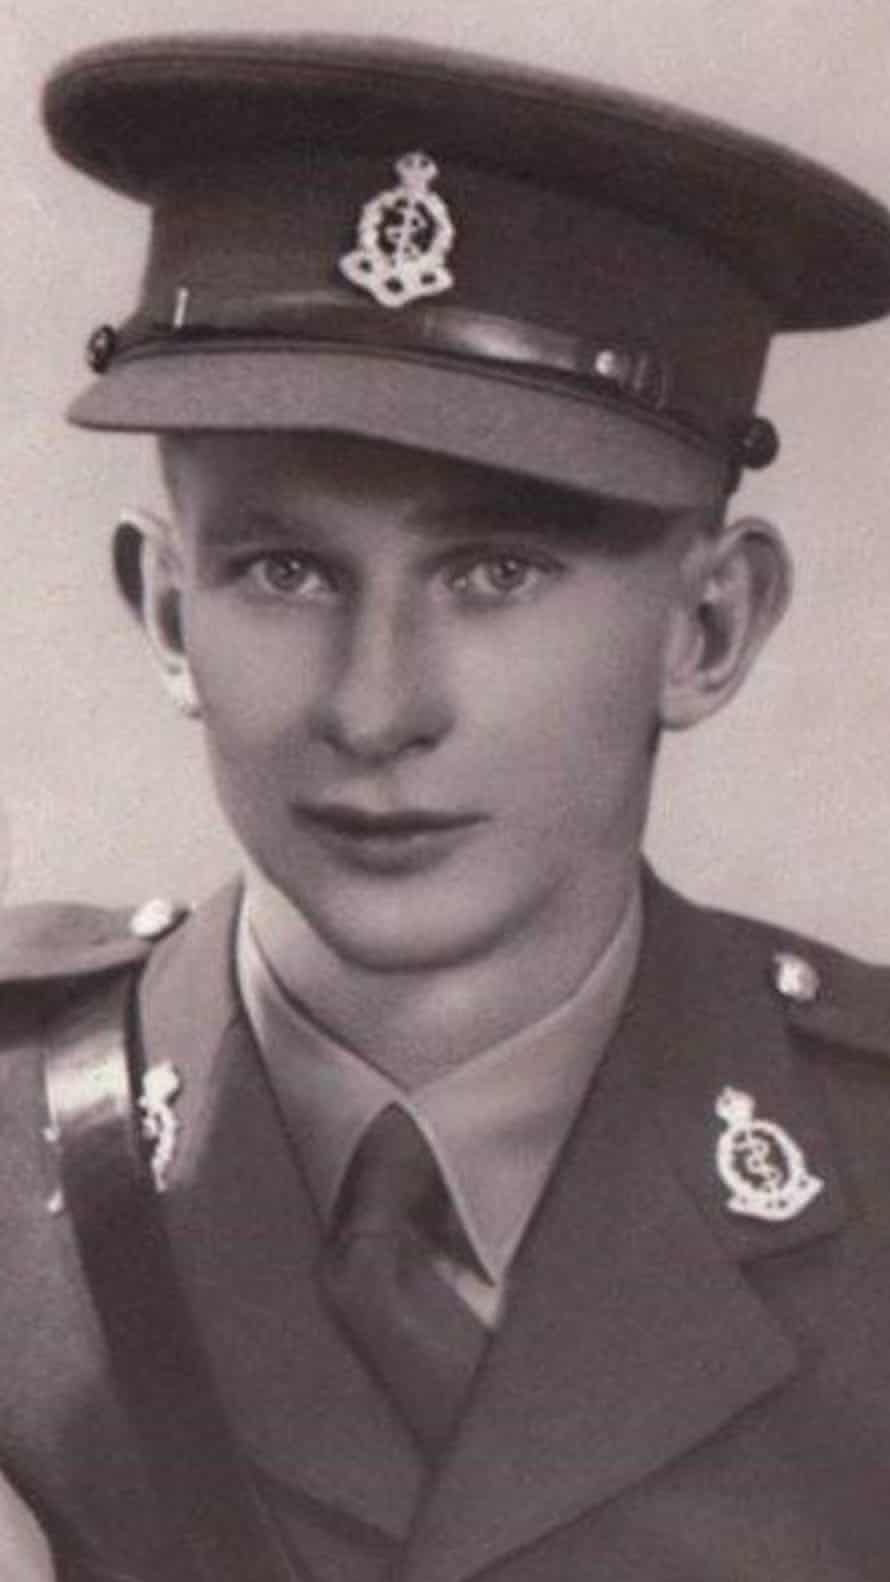 Norman 'Tony' Walker as a young man in uniform